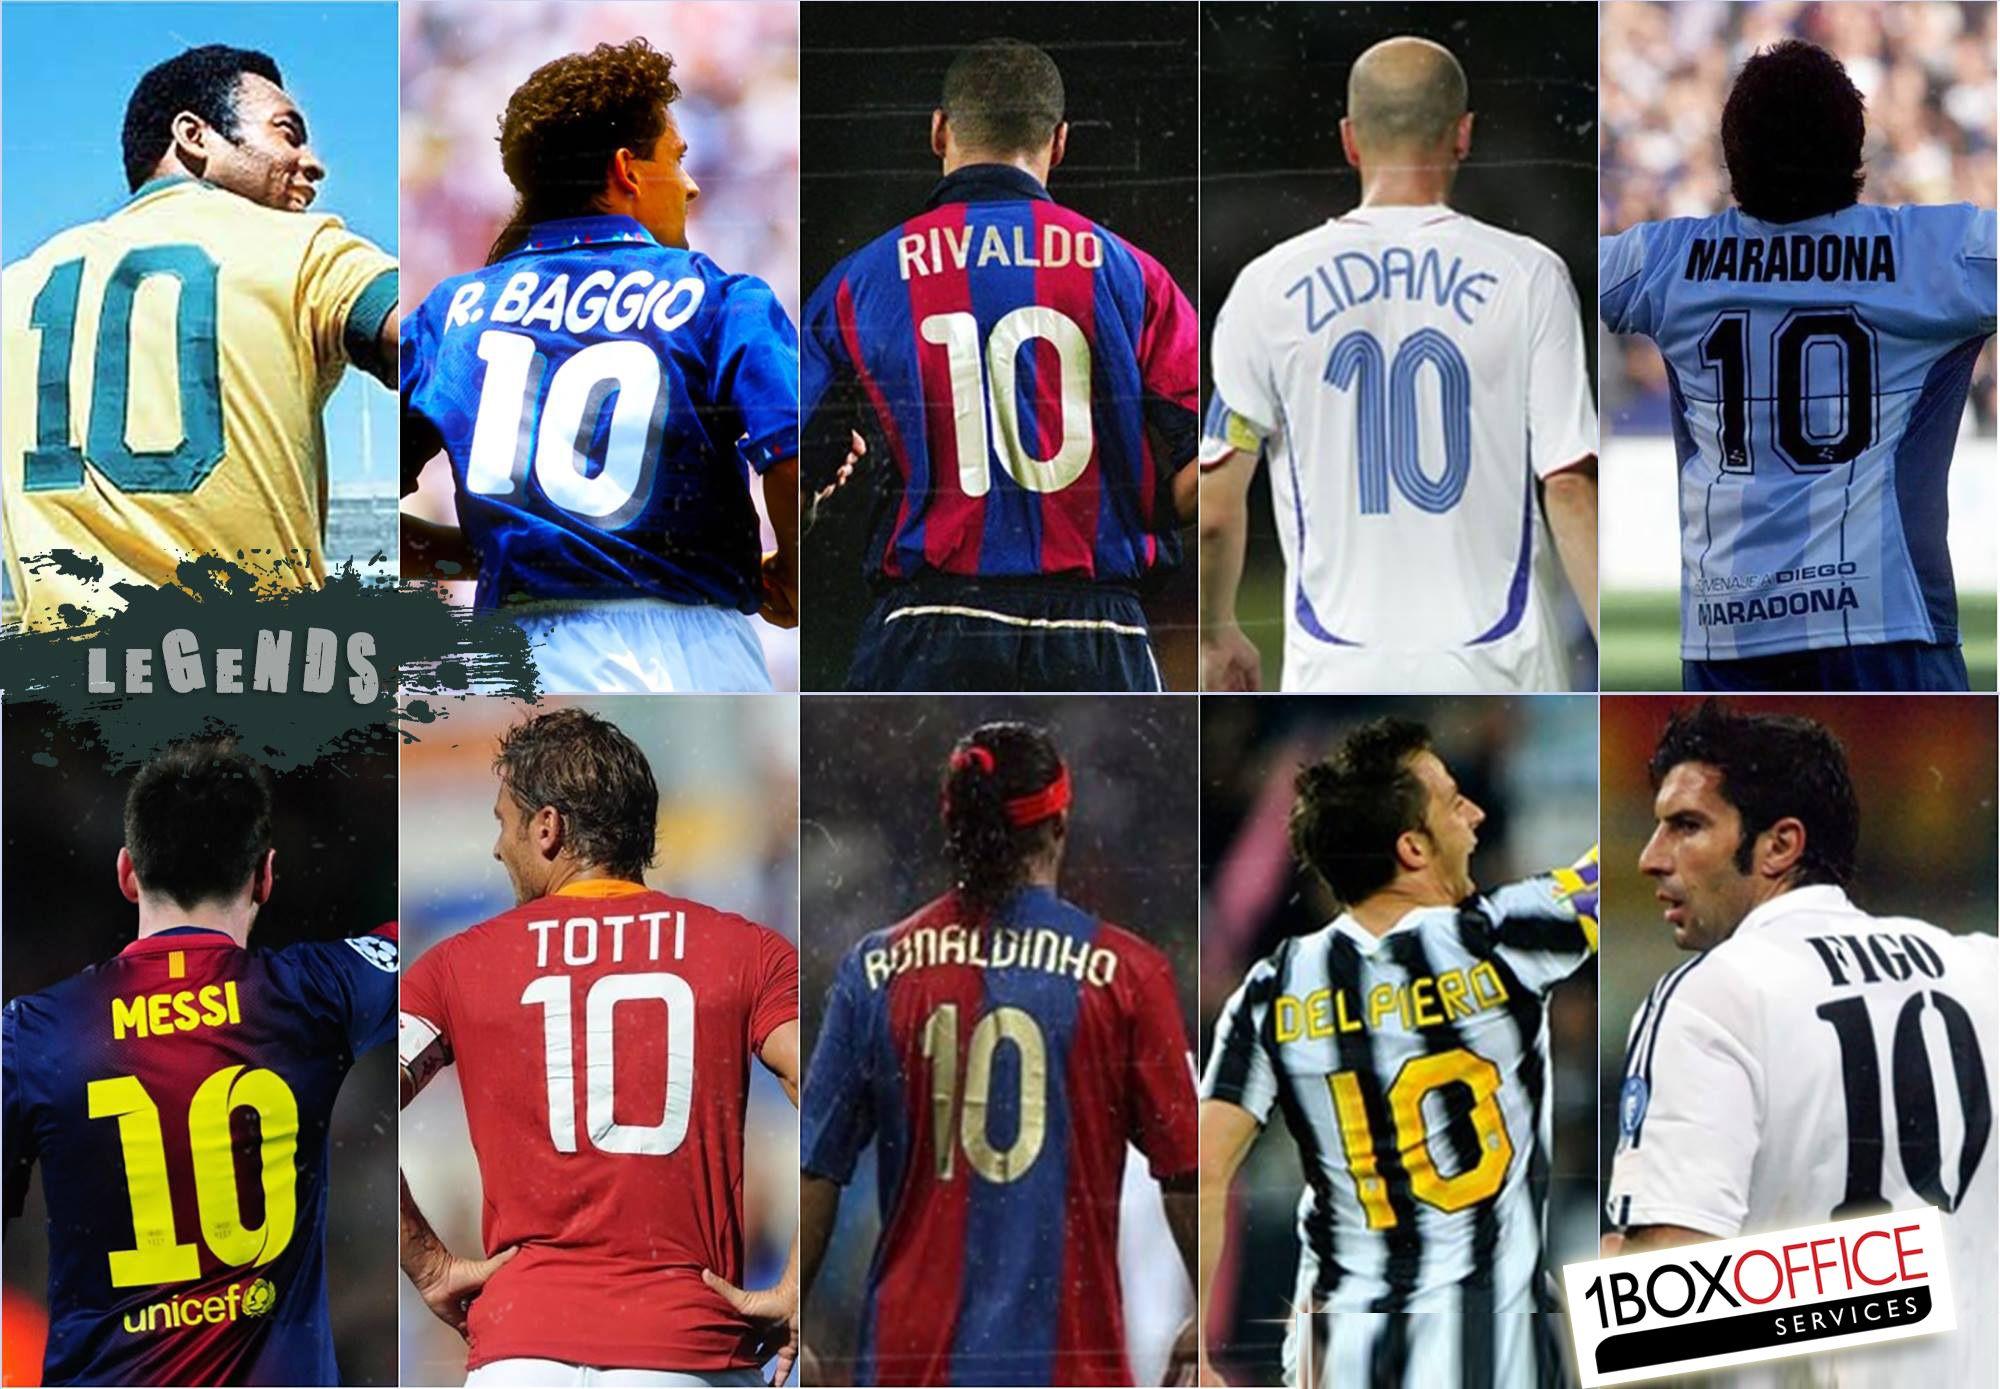 من هو أعظم من إرتدى قميص رقم 10 Www 1boxoffice Com Who S The Greatest To Wear The 10 Jersey Lionel Messi Sport Event Football